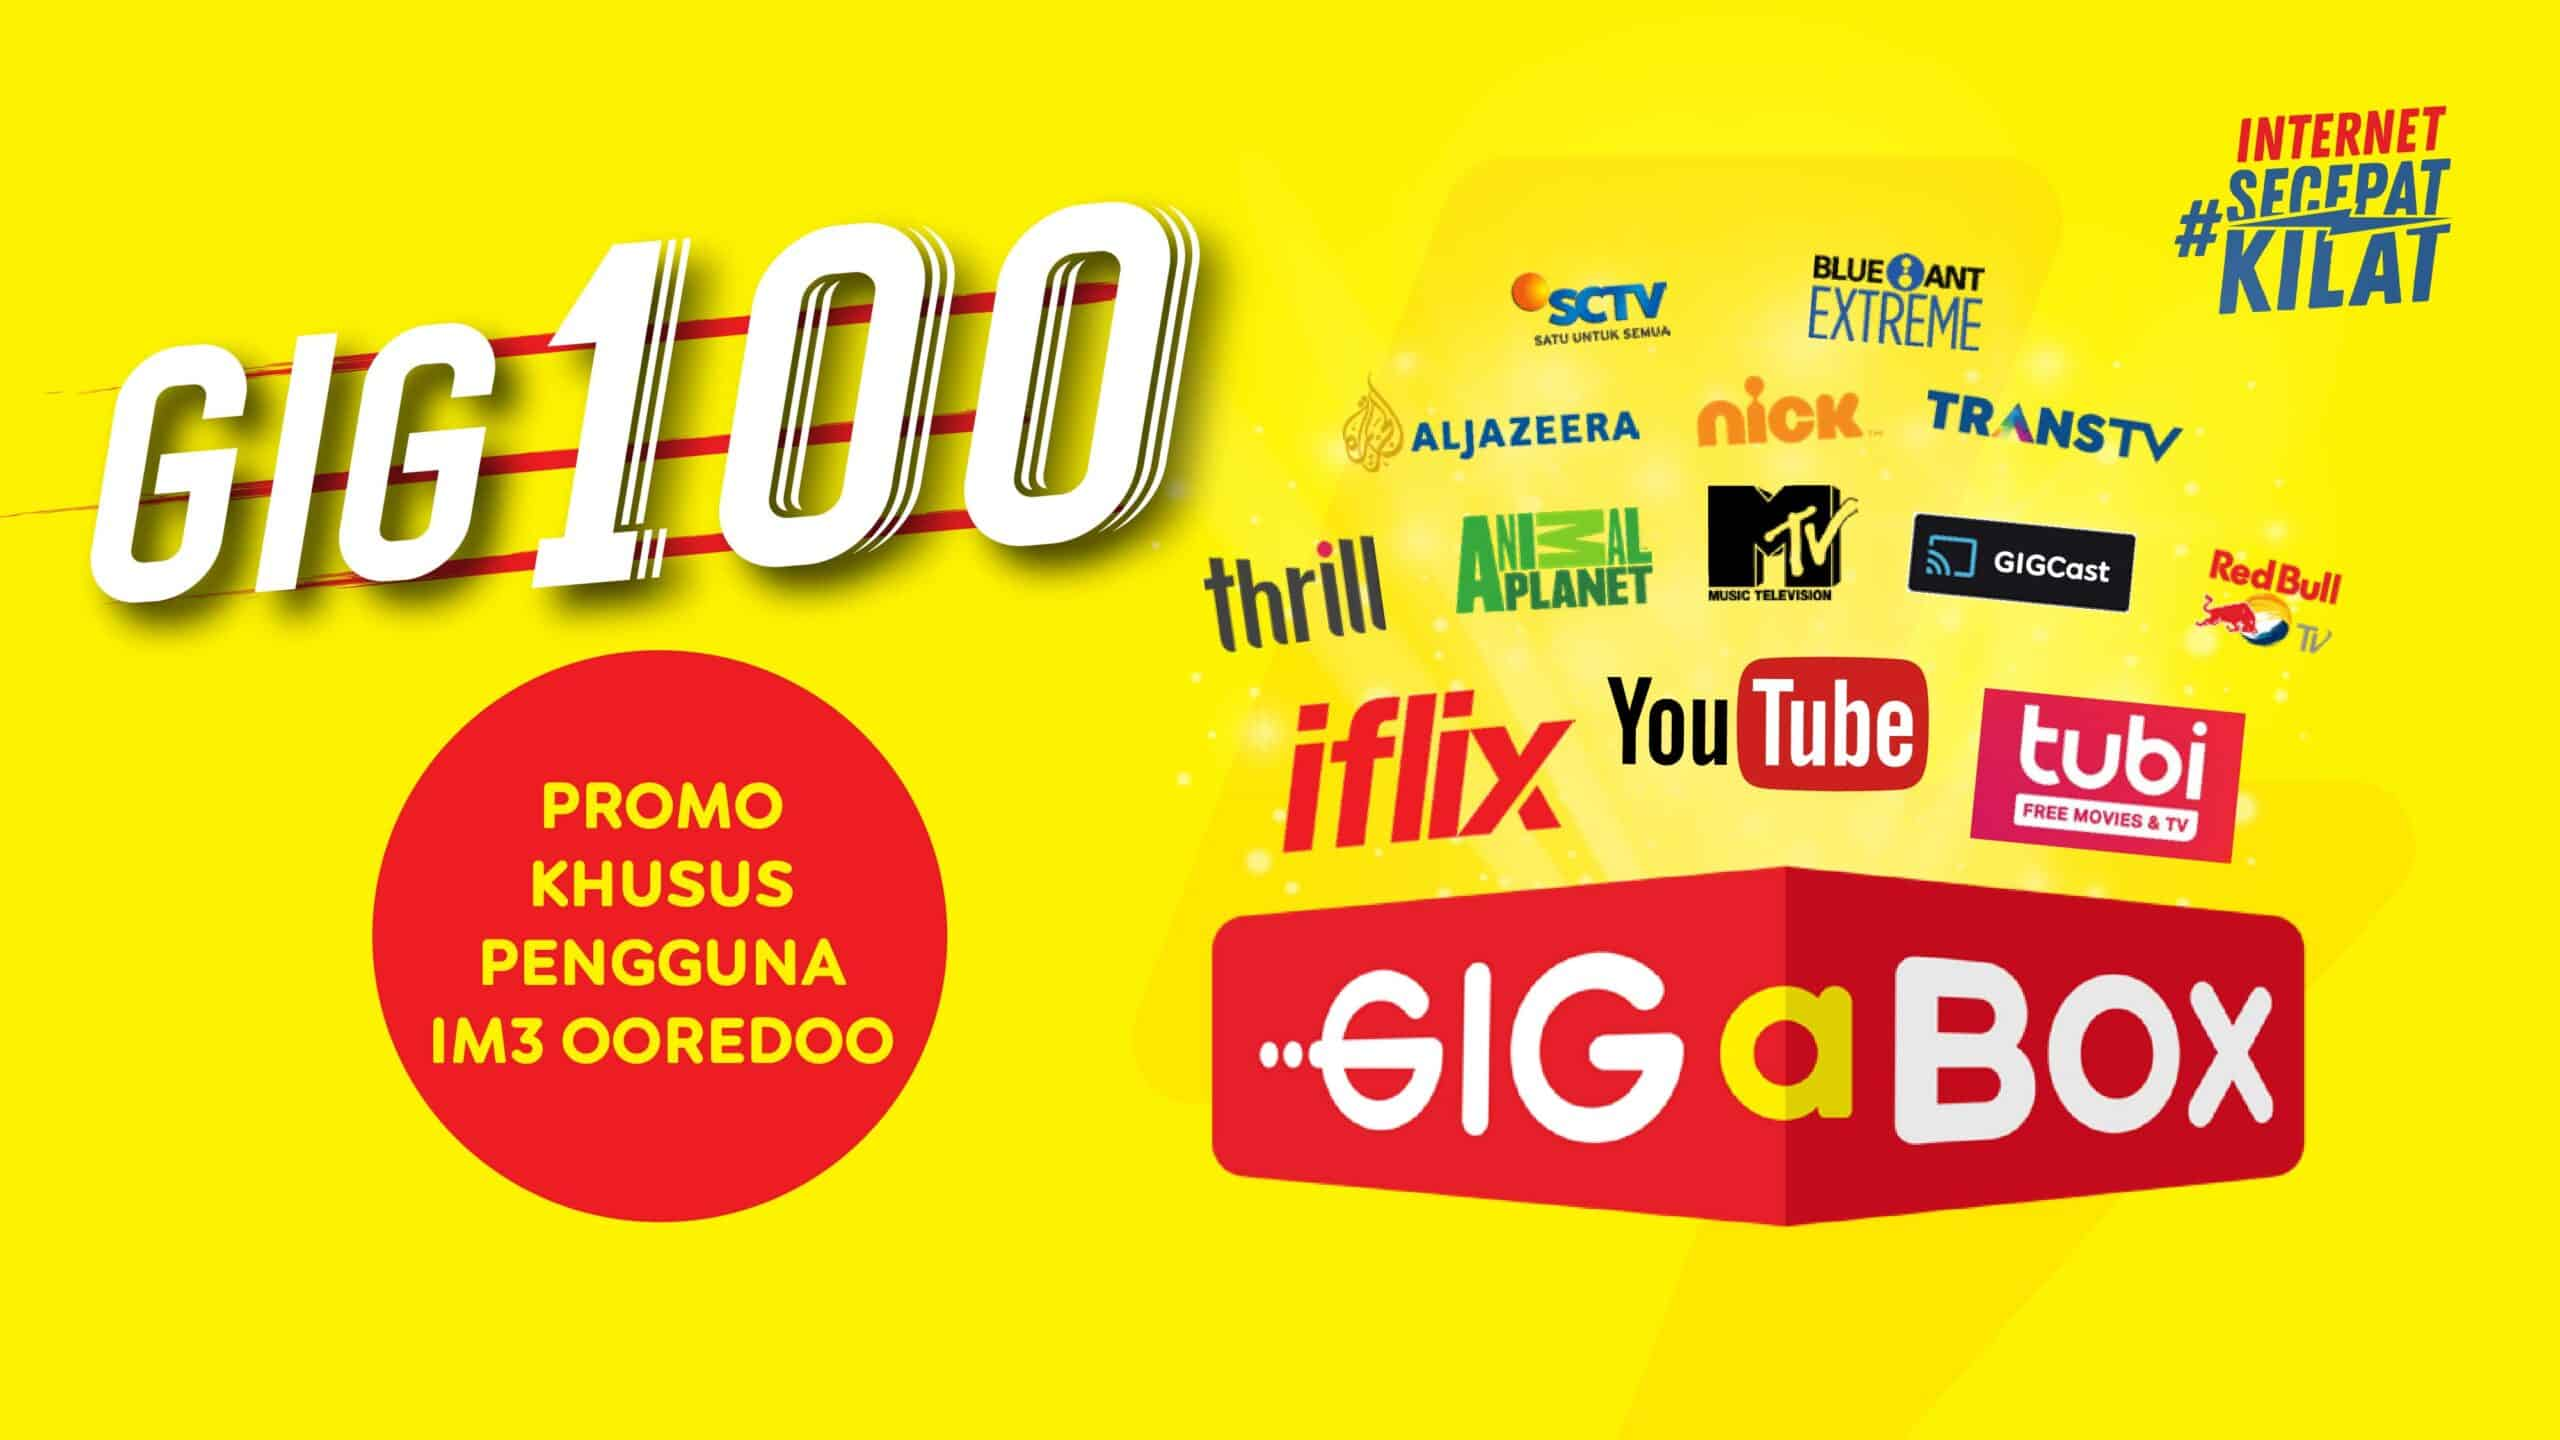 Daftar Harga Paket Internet Gig Indosat 20 30 50 Mb 1 Gb